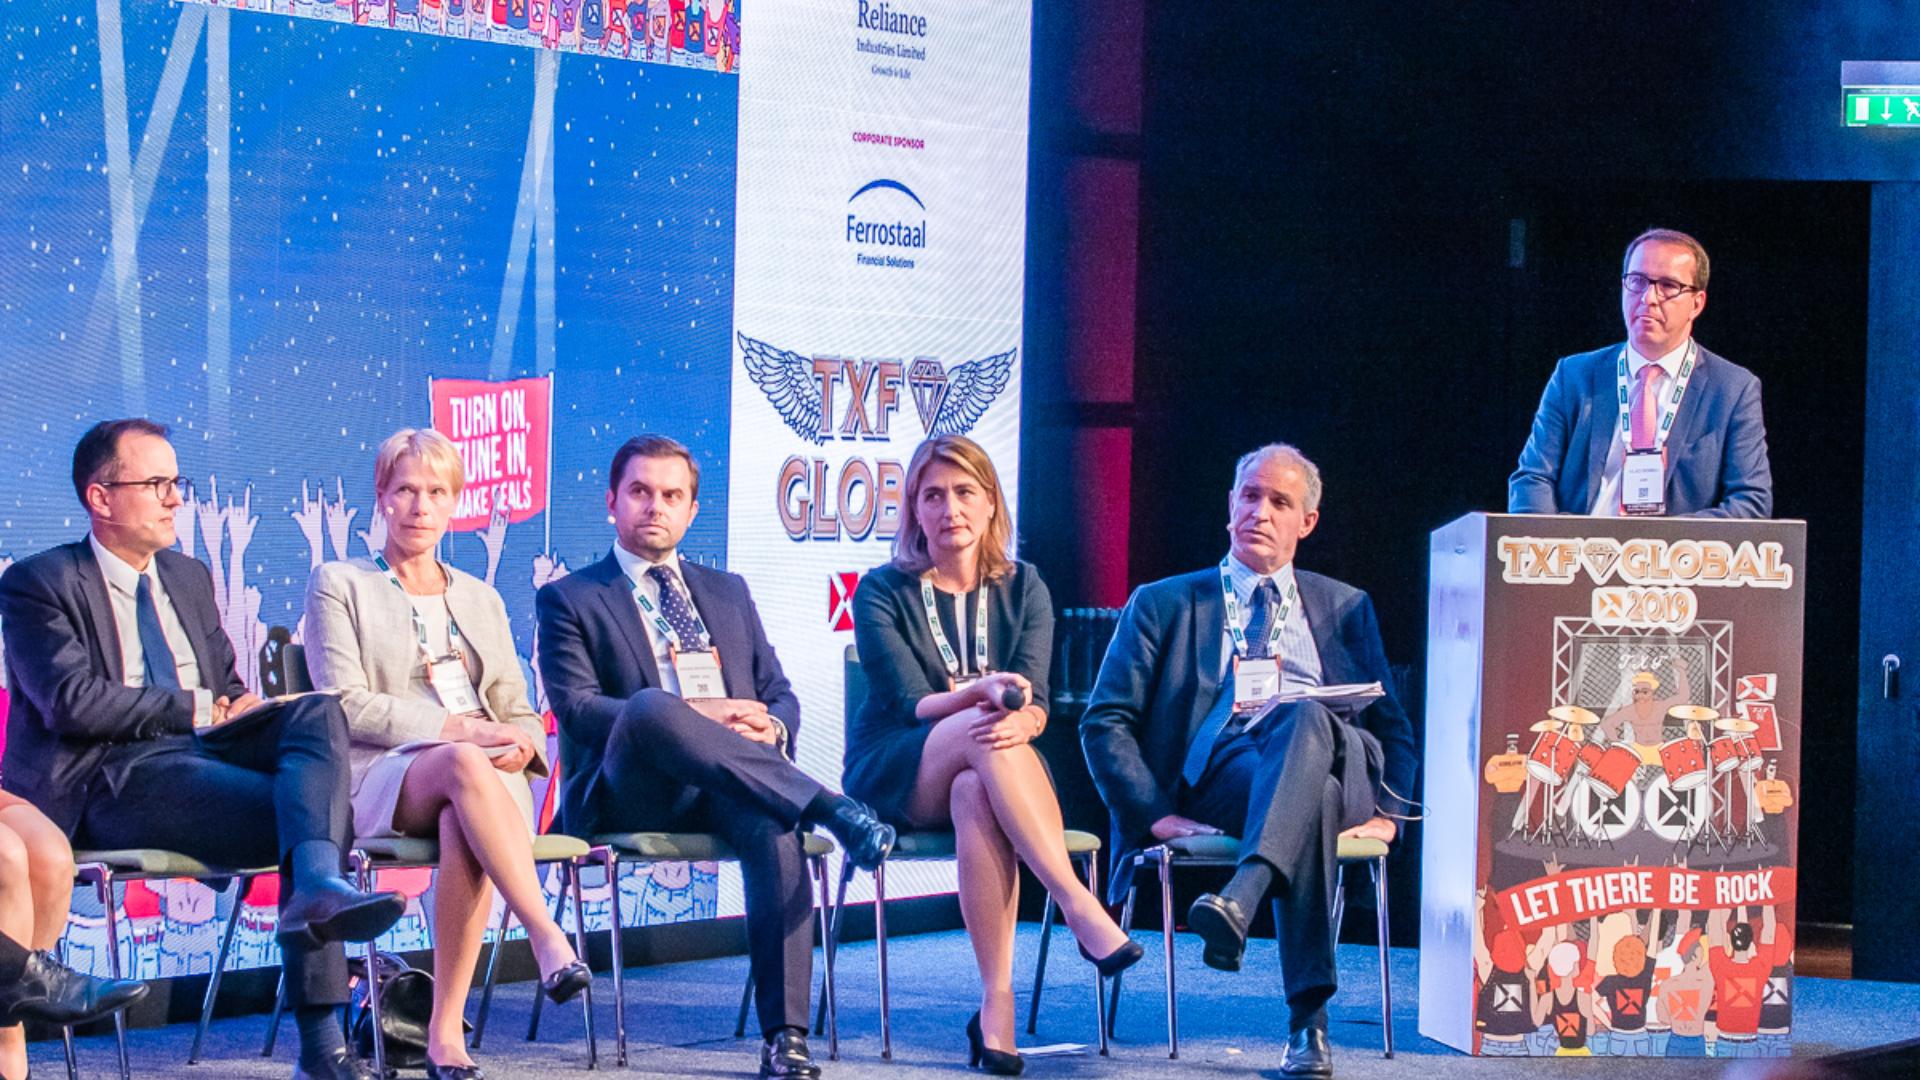 Keynote panel: Banking leaders' observations